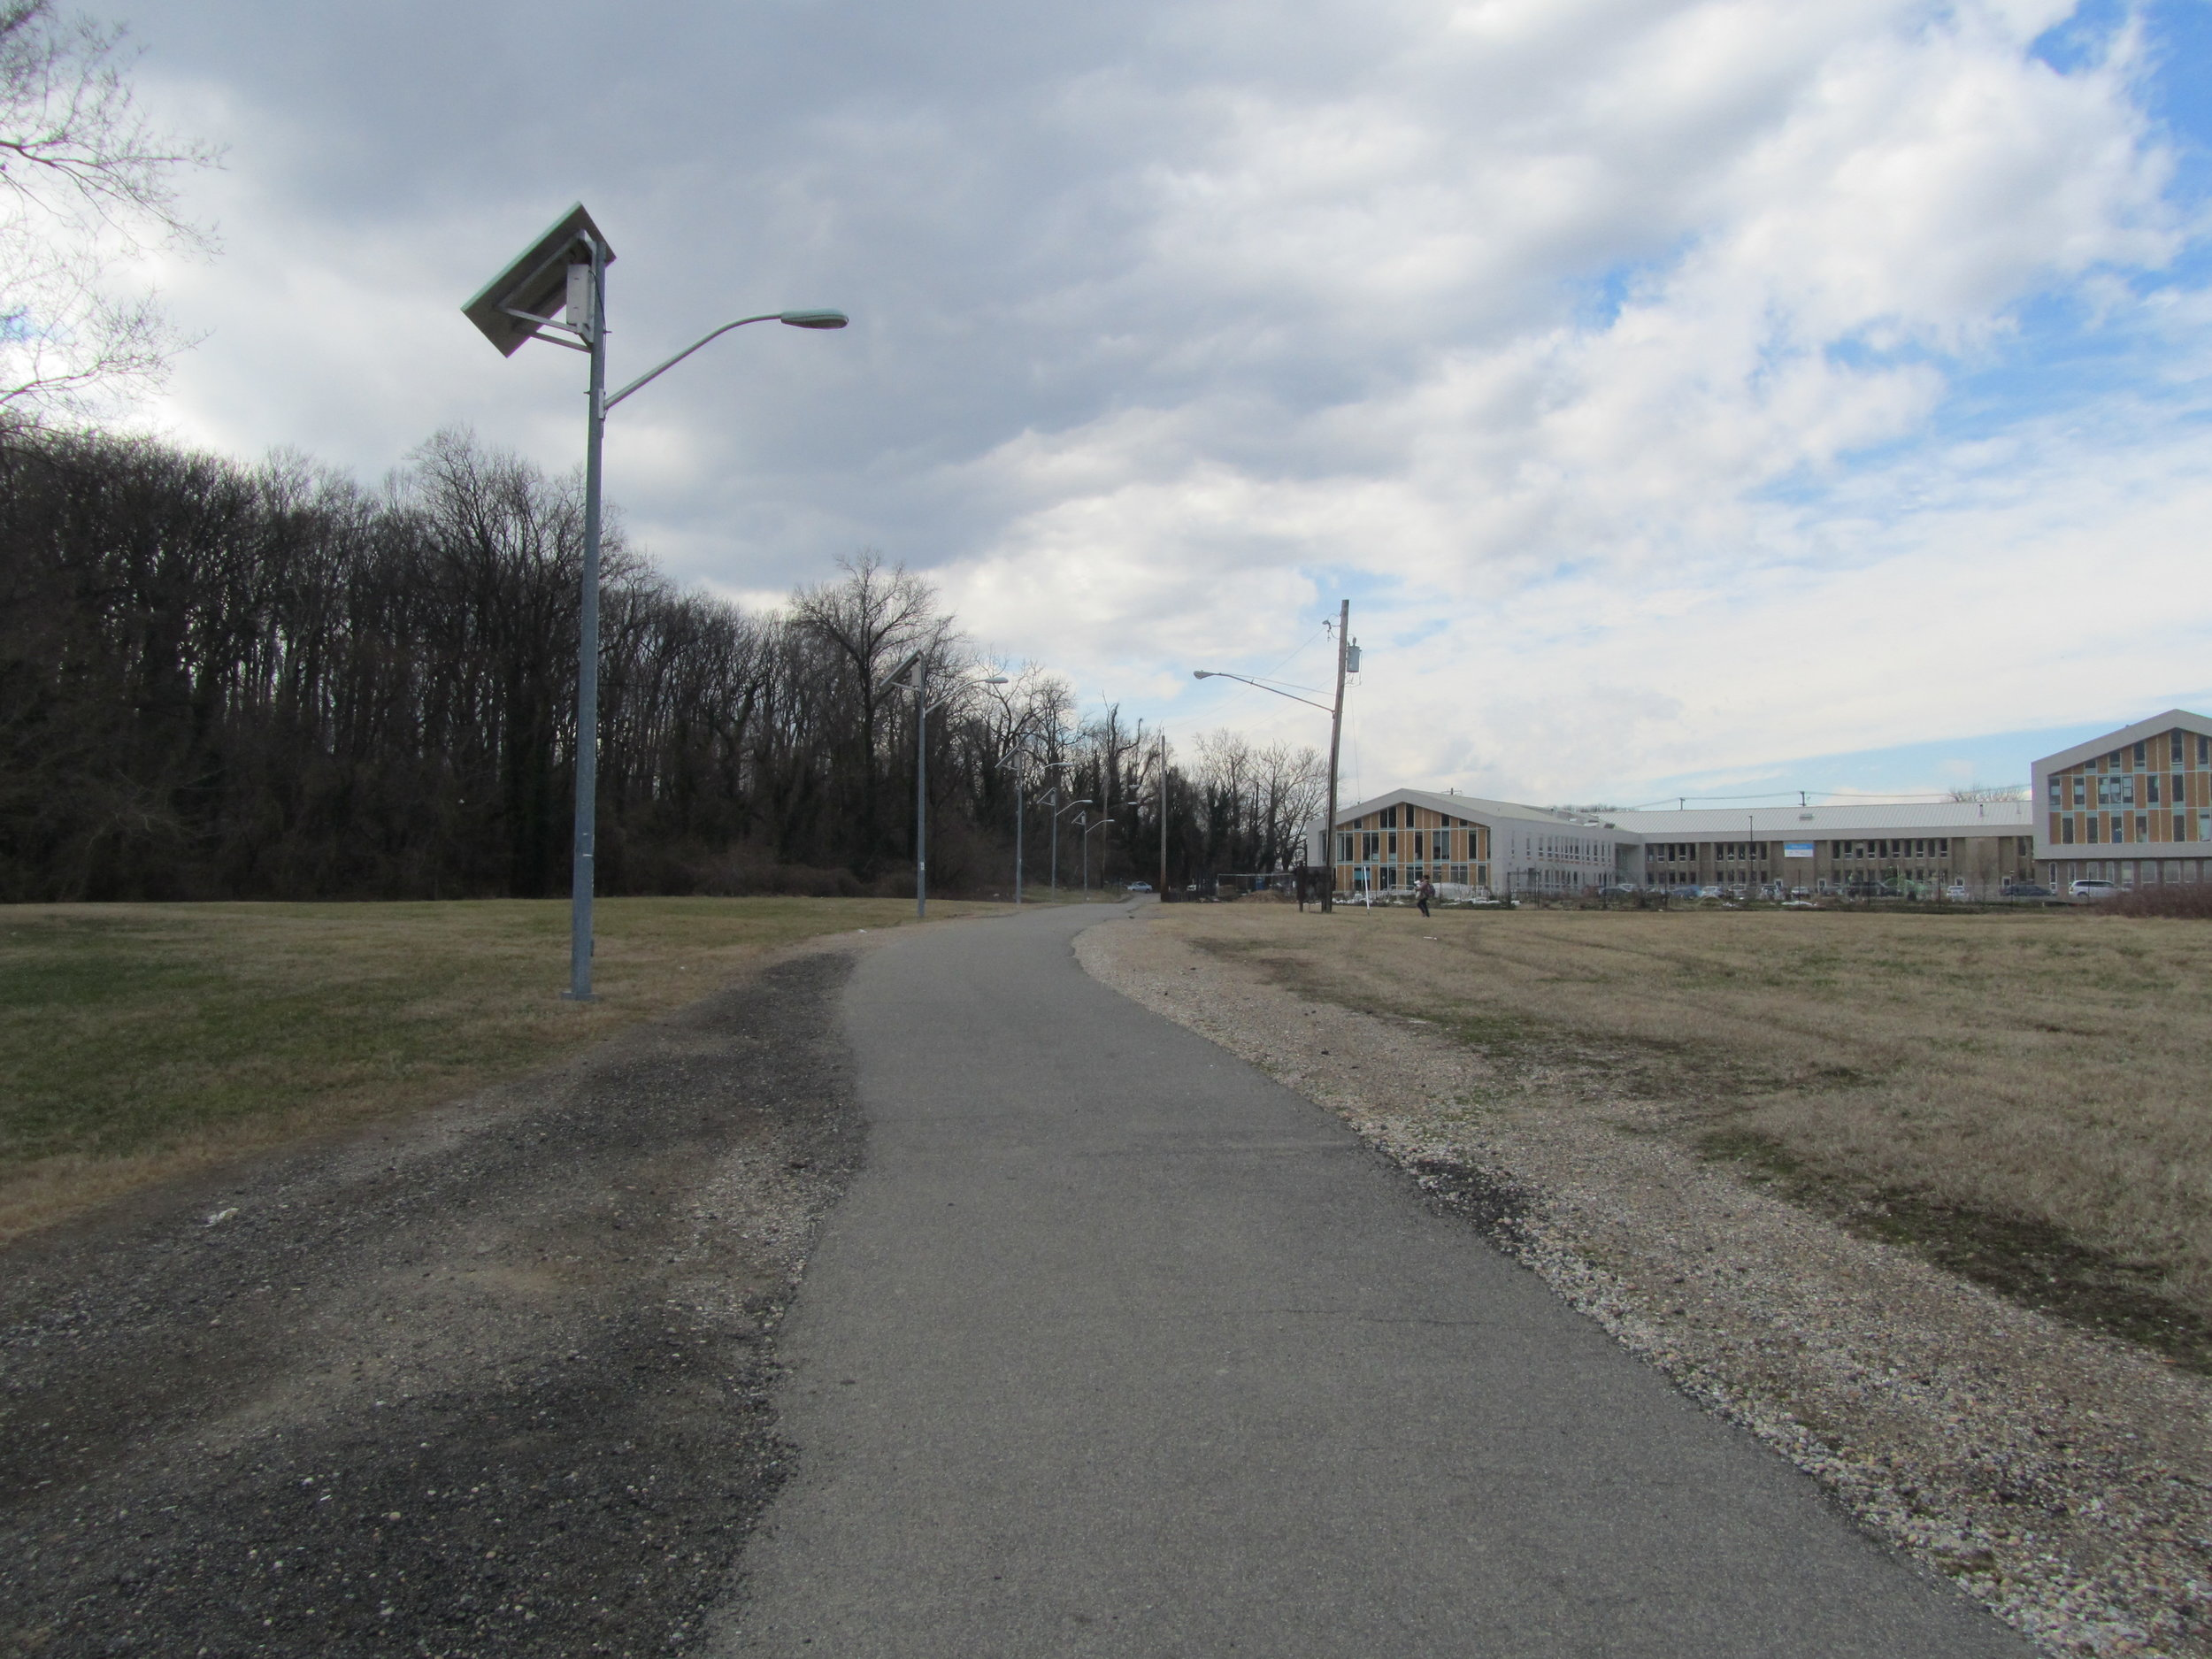 Trail between 1st Pl, NE and Gallatin St, NE